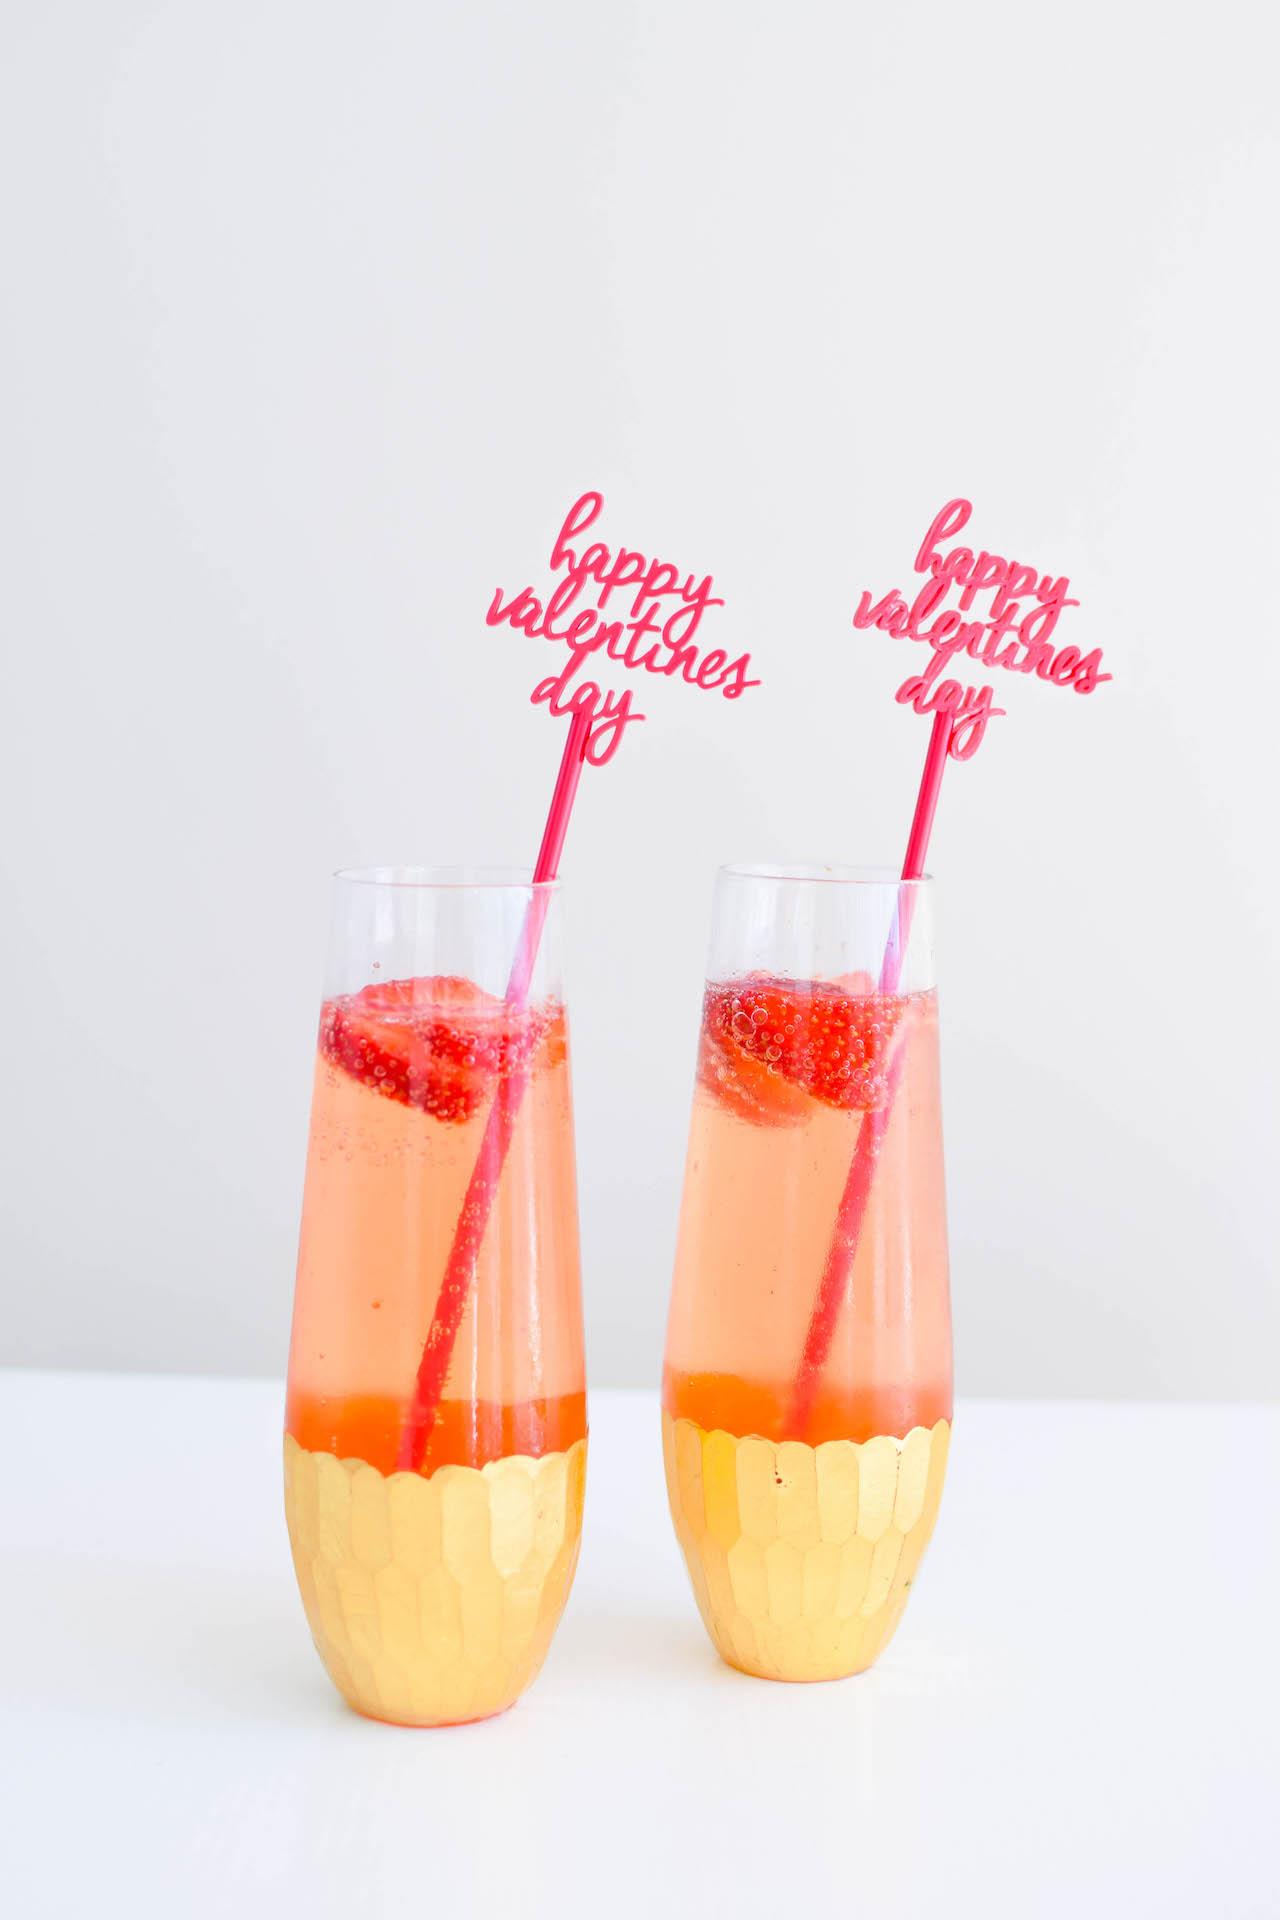 strawberry gin fix cocktail valentines day